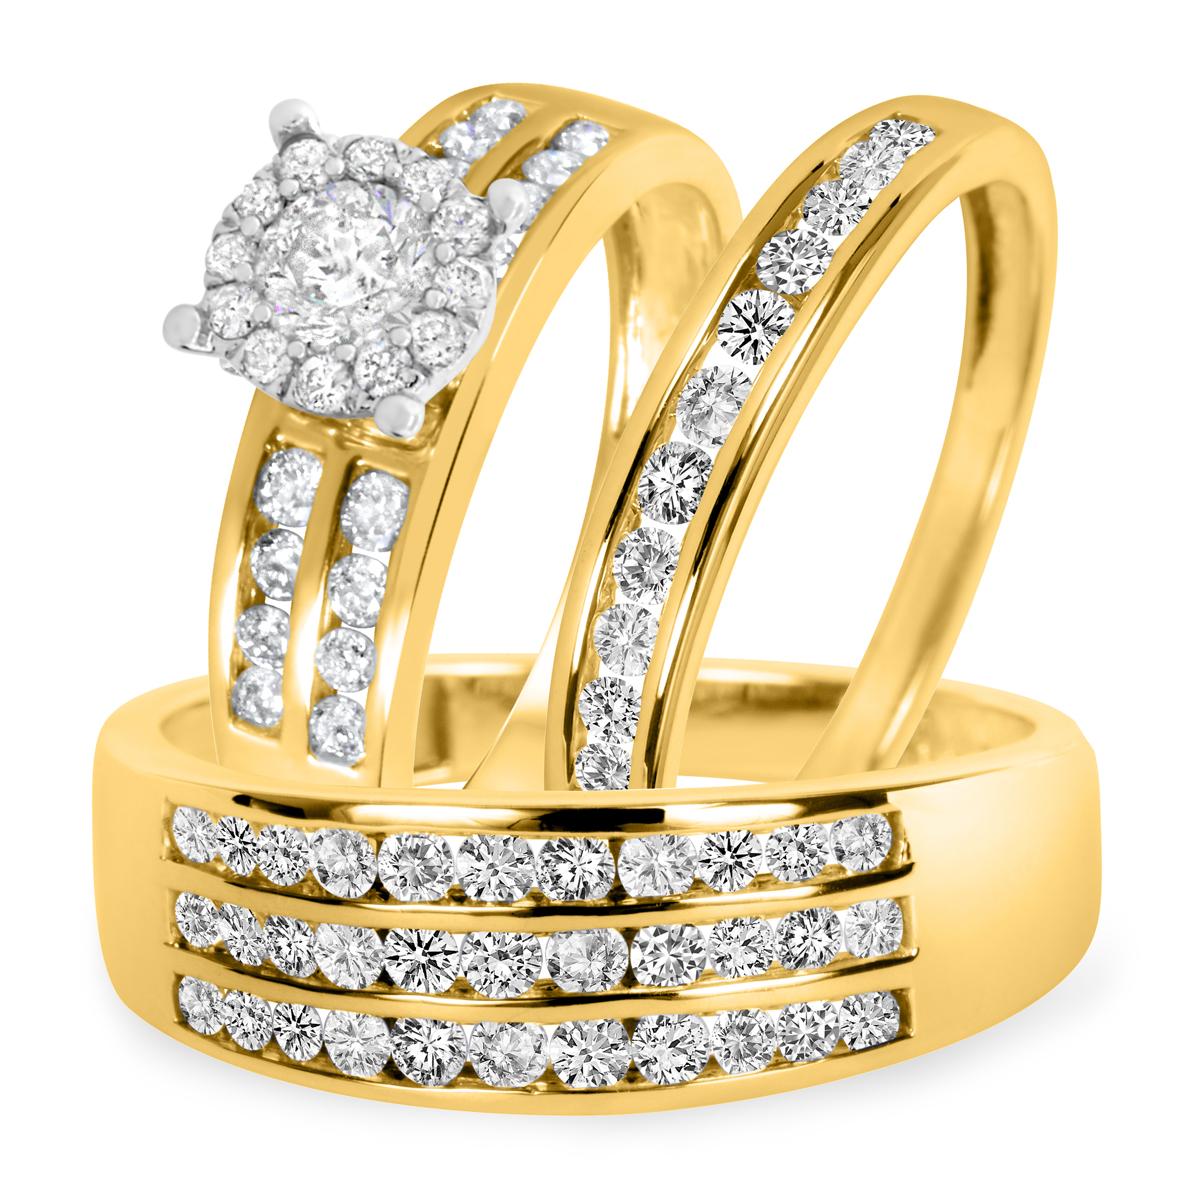 1 5/8 CT. T.W. Diamond Ladies Engagement Ring, Wedding Band, Men's Wedding Band